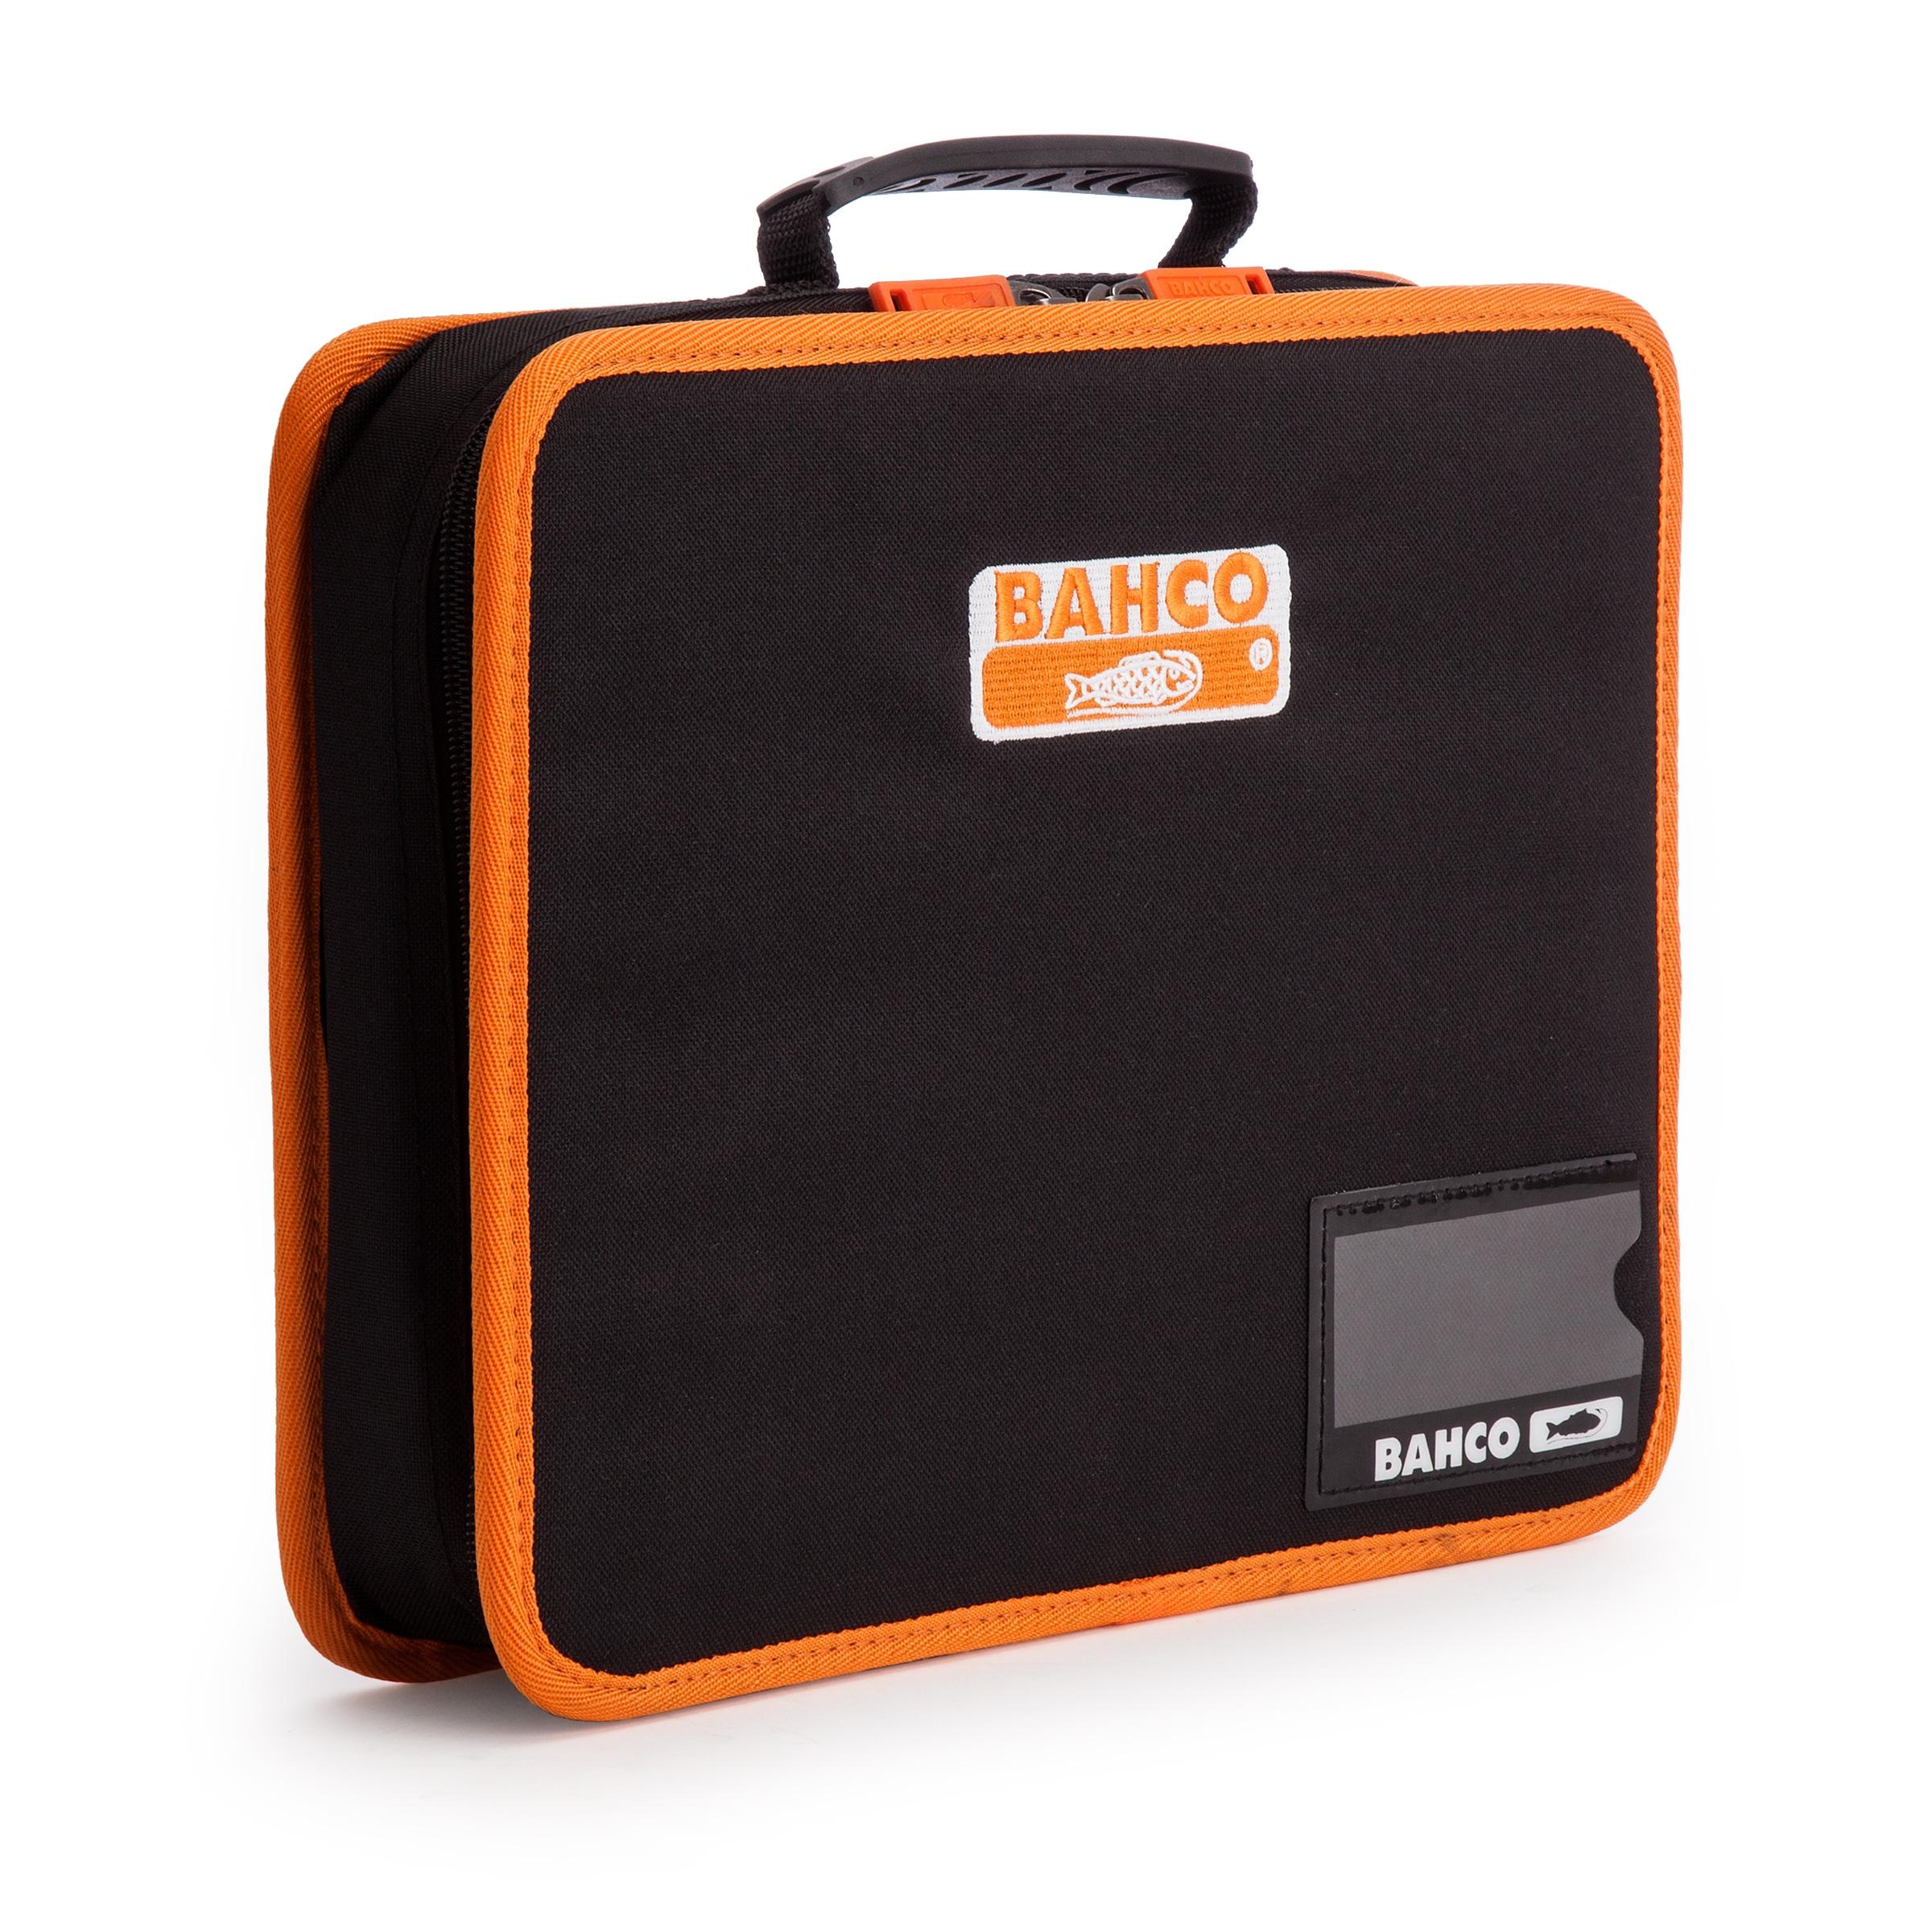 Bahco 4750FB5B Tool Organiser Case